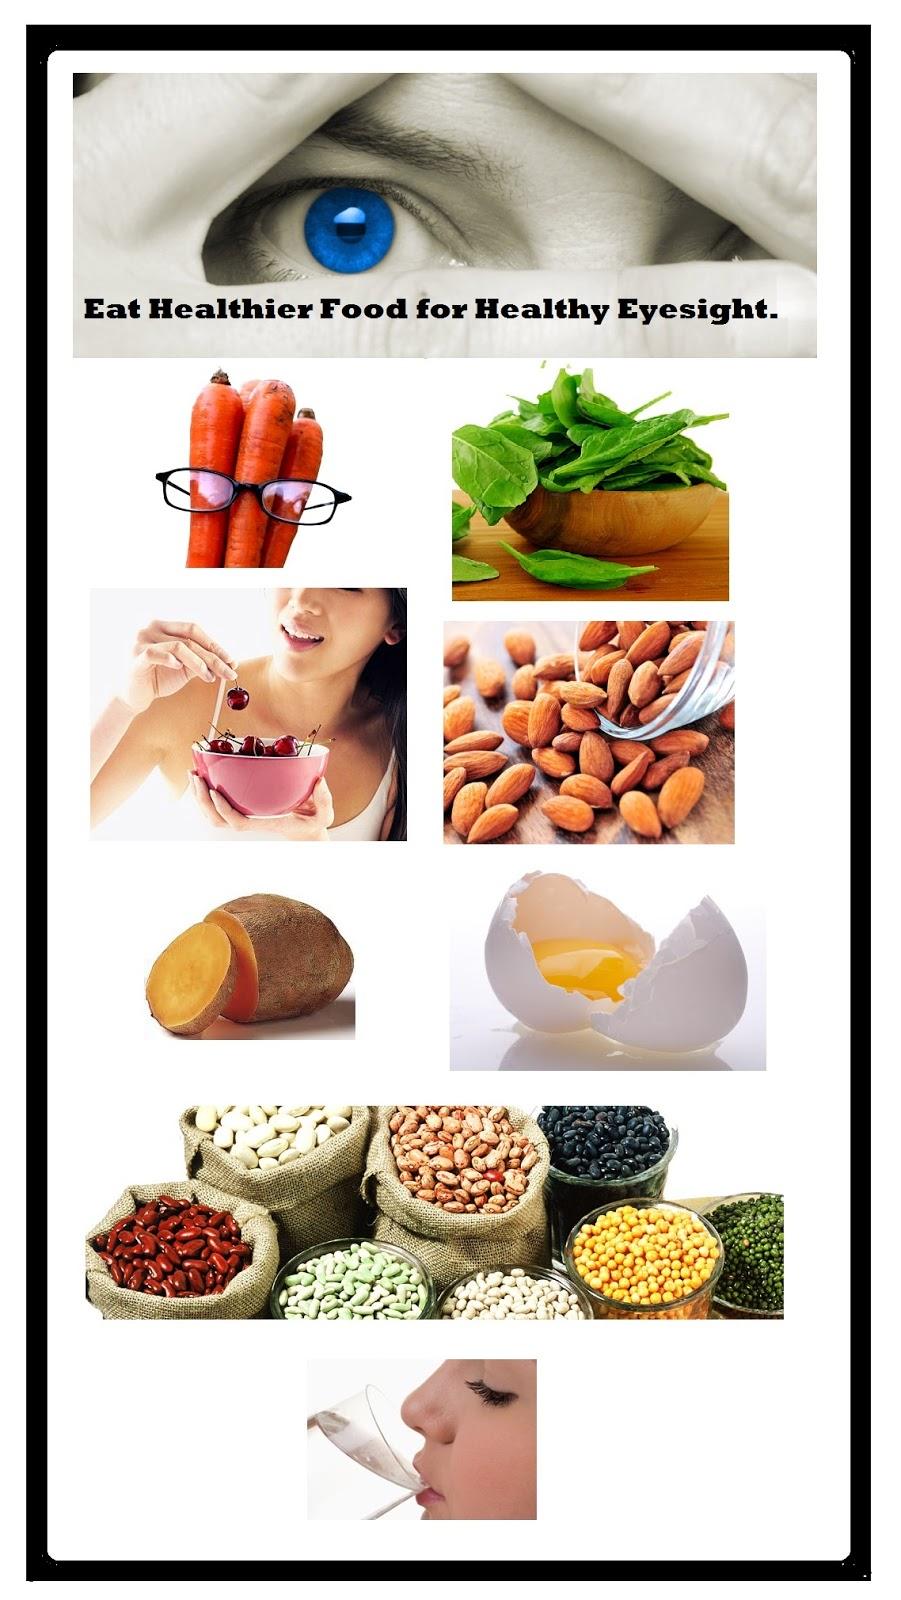 Eat Healthier Food For Healthy Eyesight Sexual Health